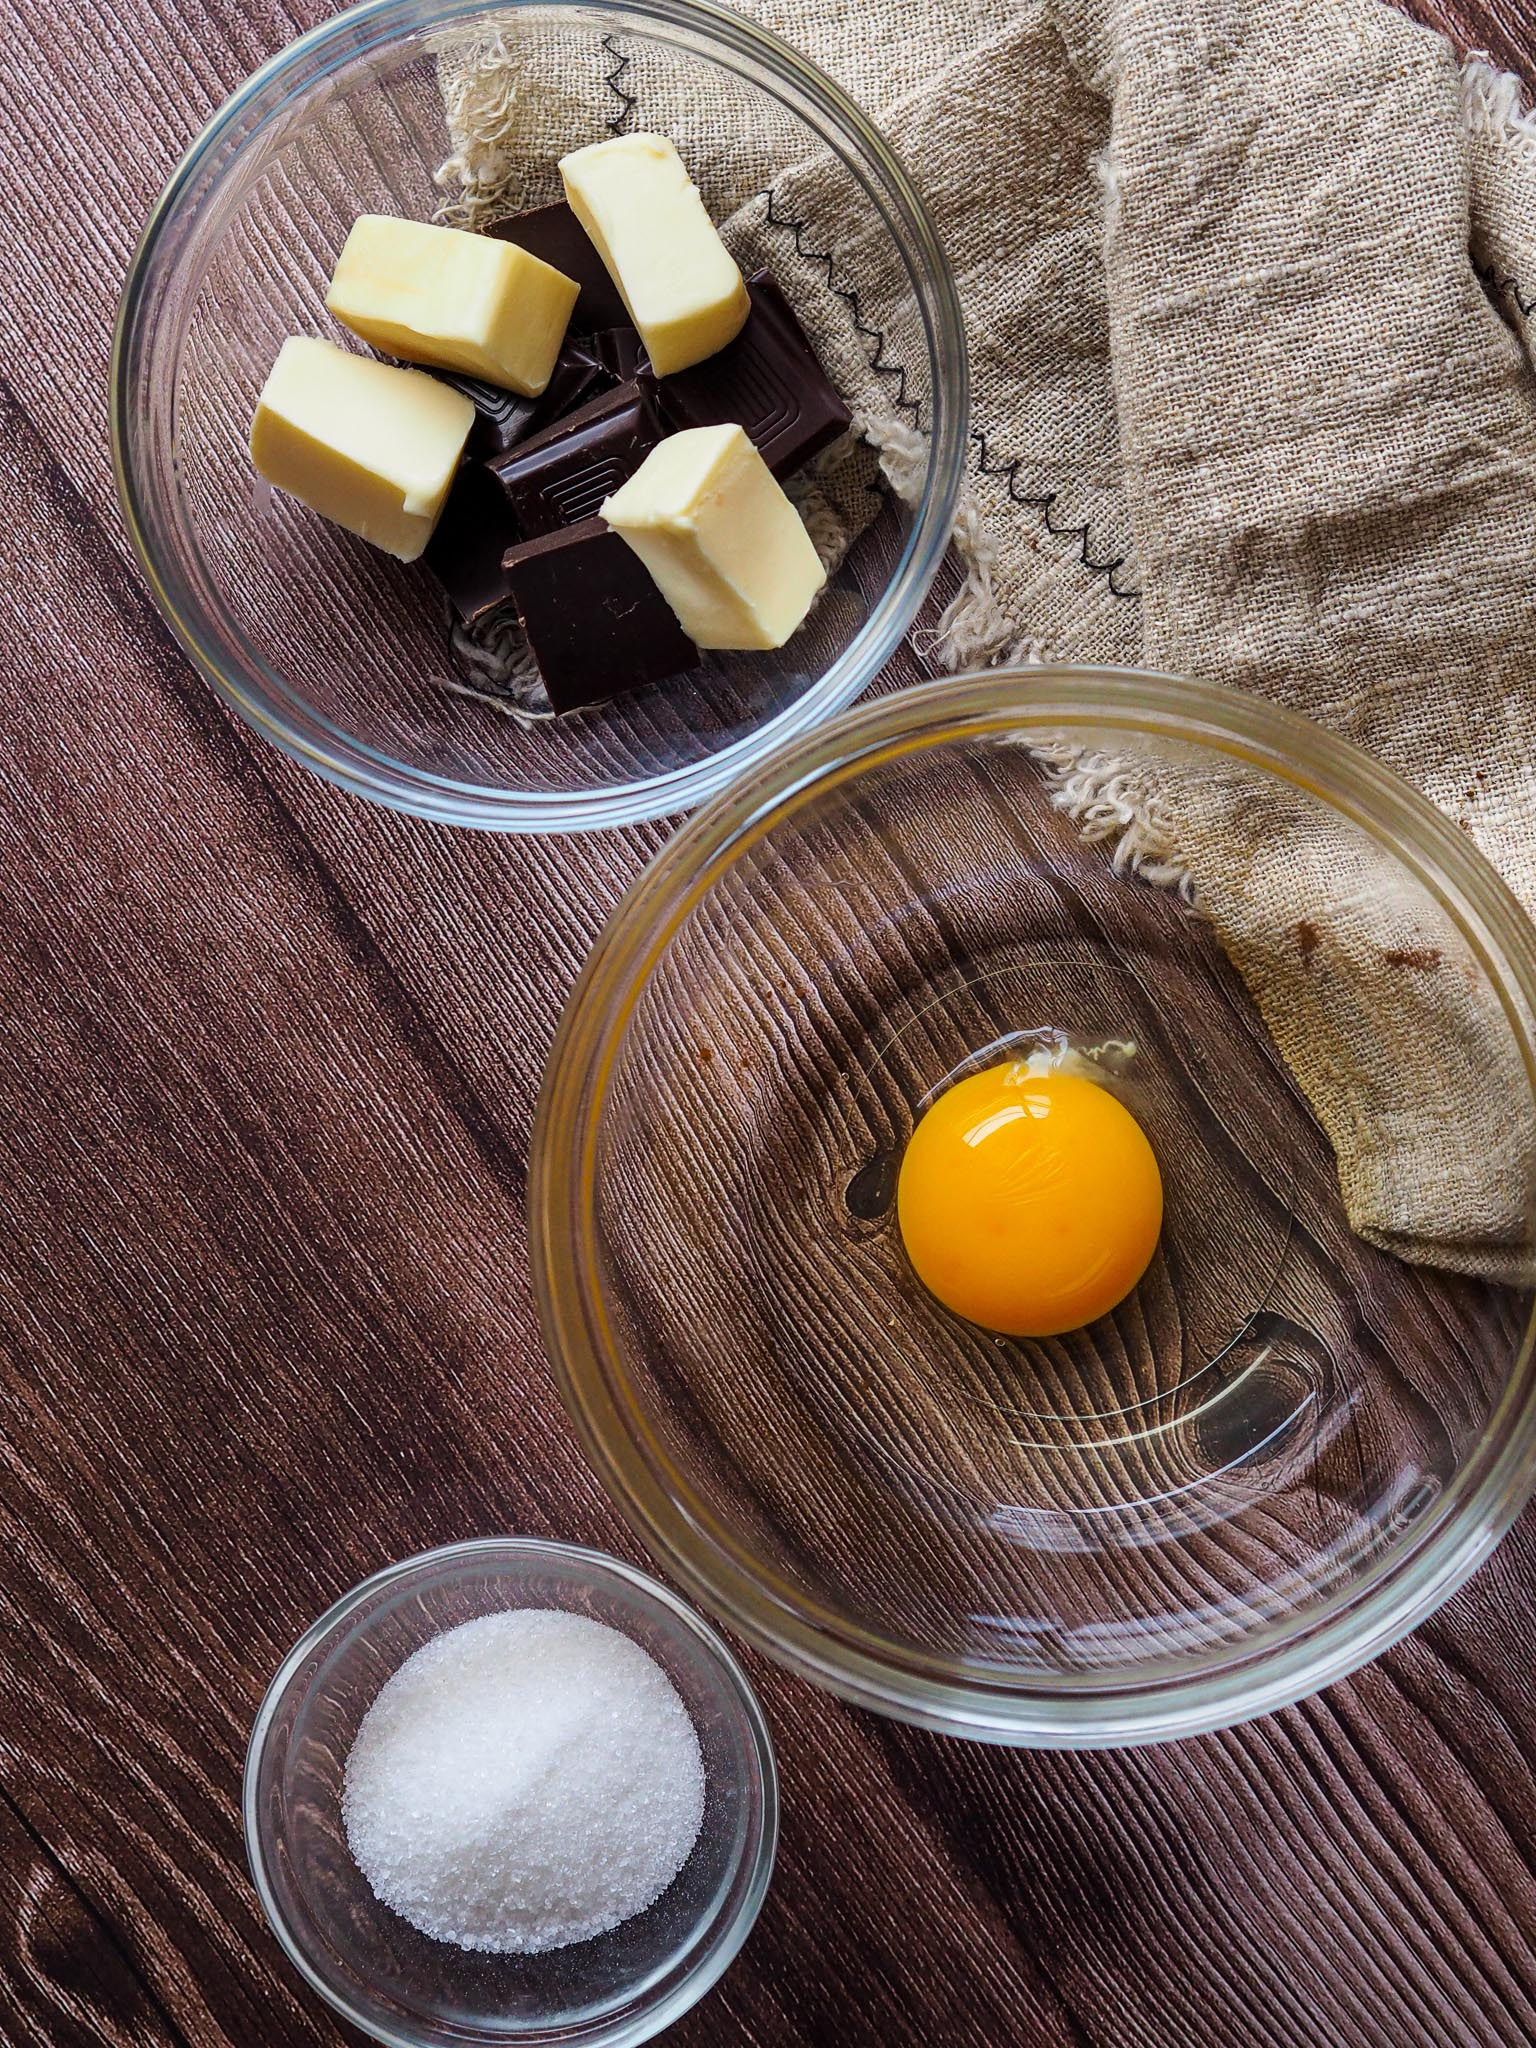 white chocolate chip cookies method